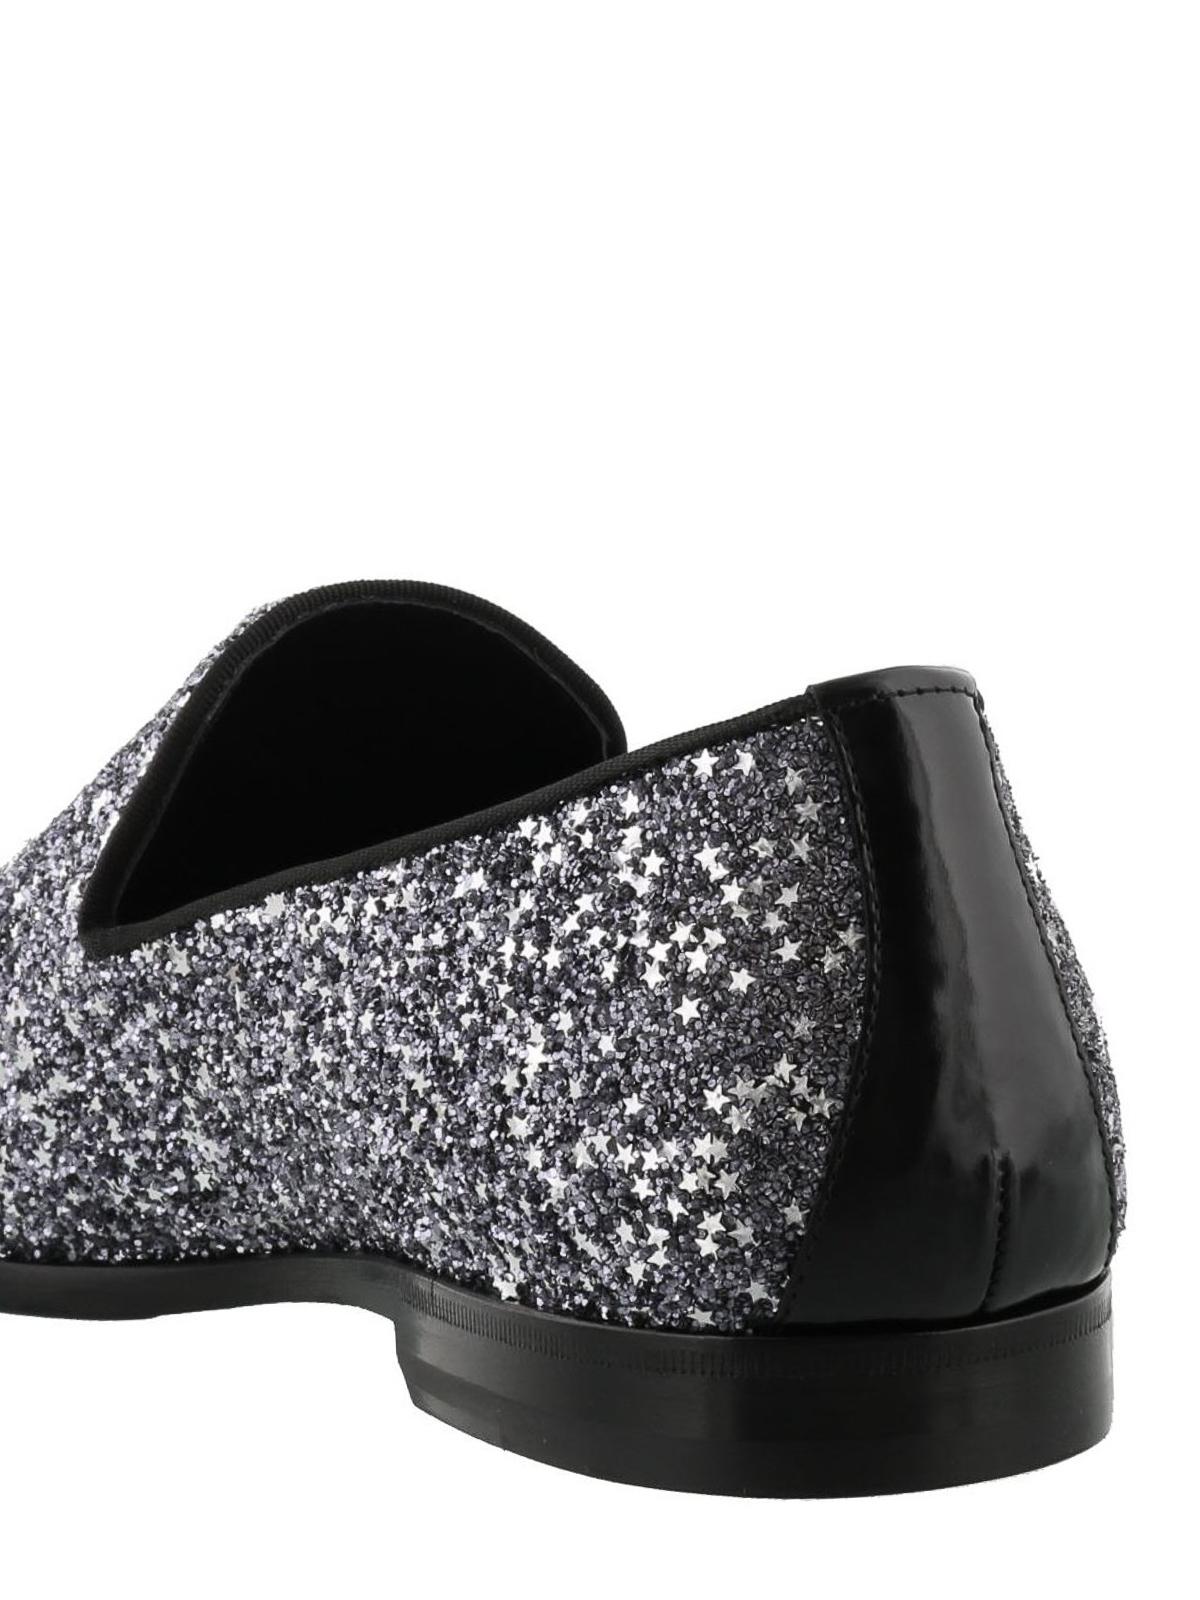 3ed1c9086ebd6 Jimmy Choo - Marlo gunmetal coarse glitter shoes - Loafers ...